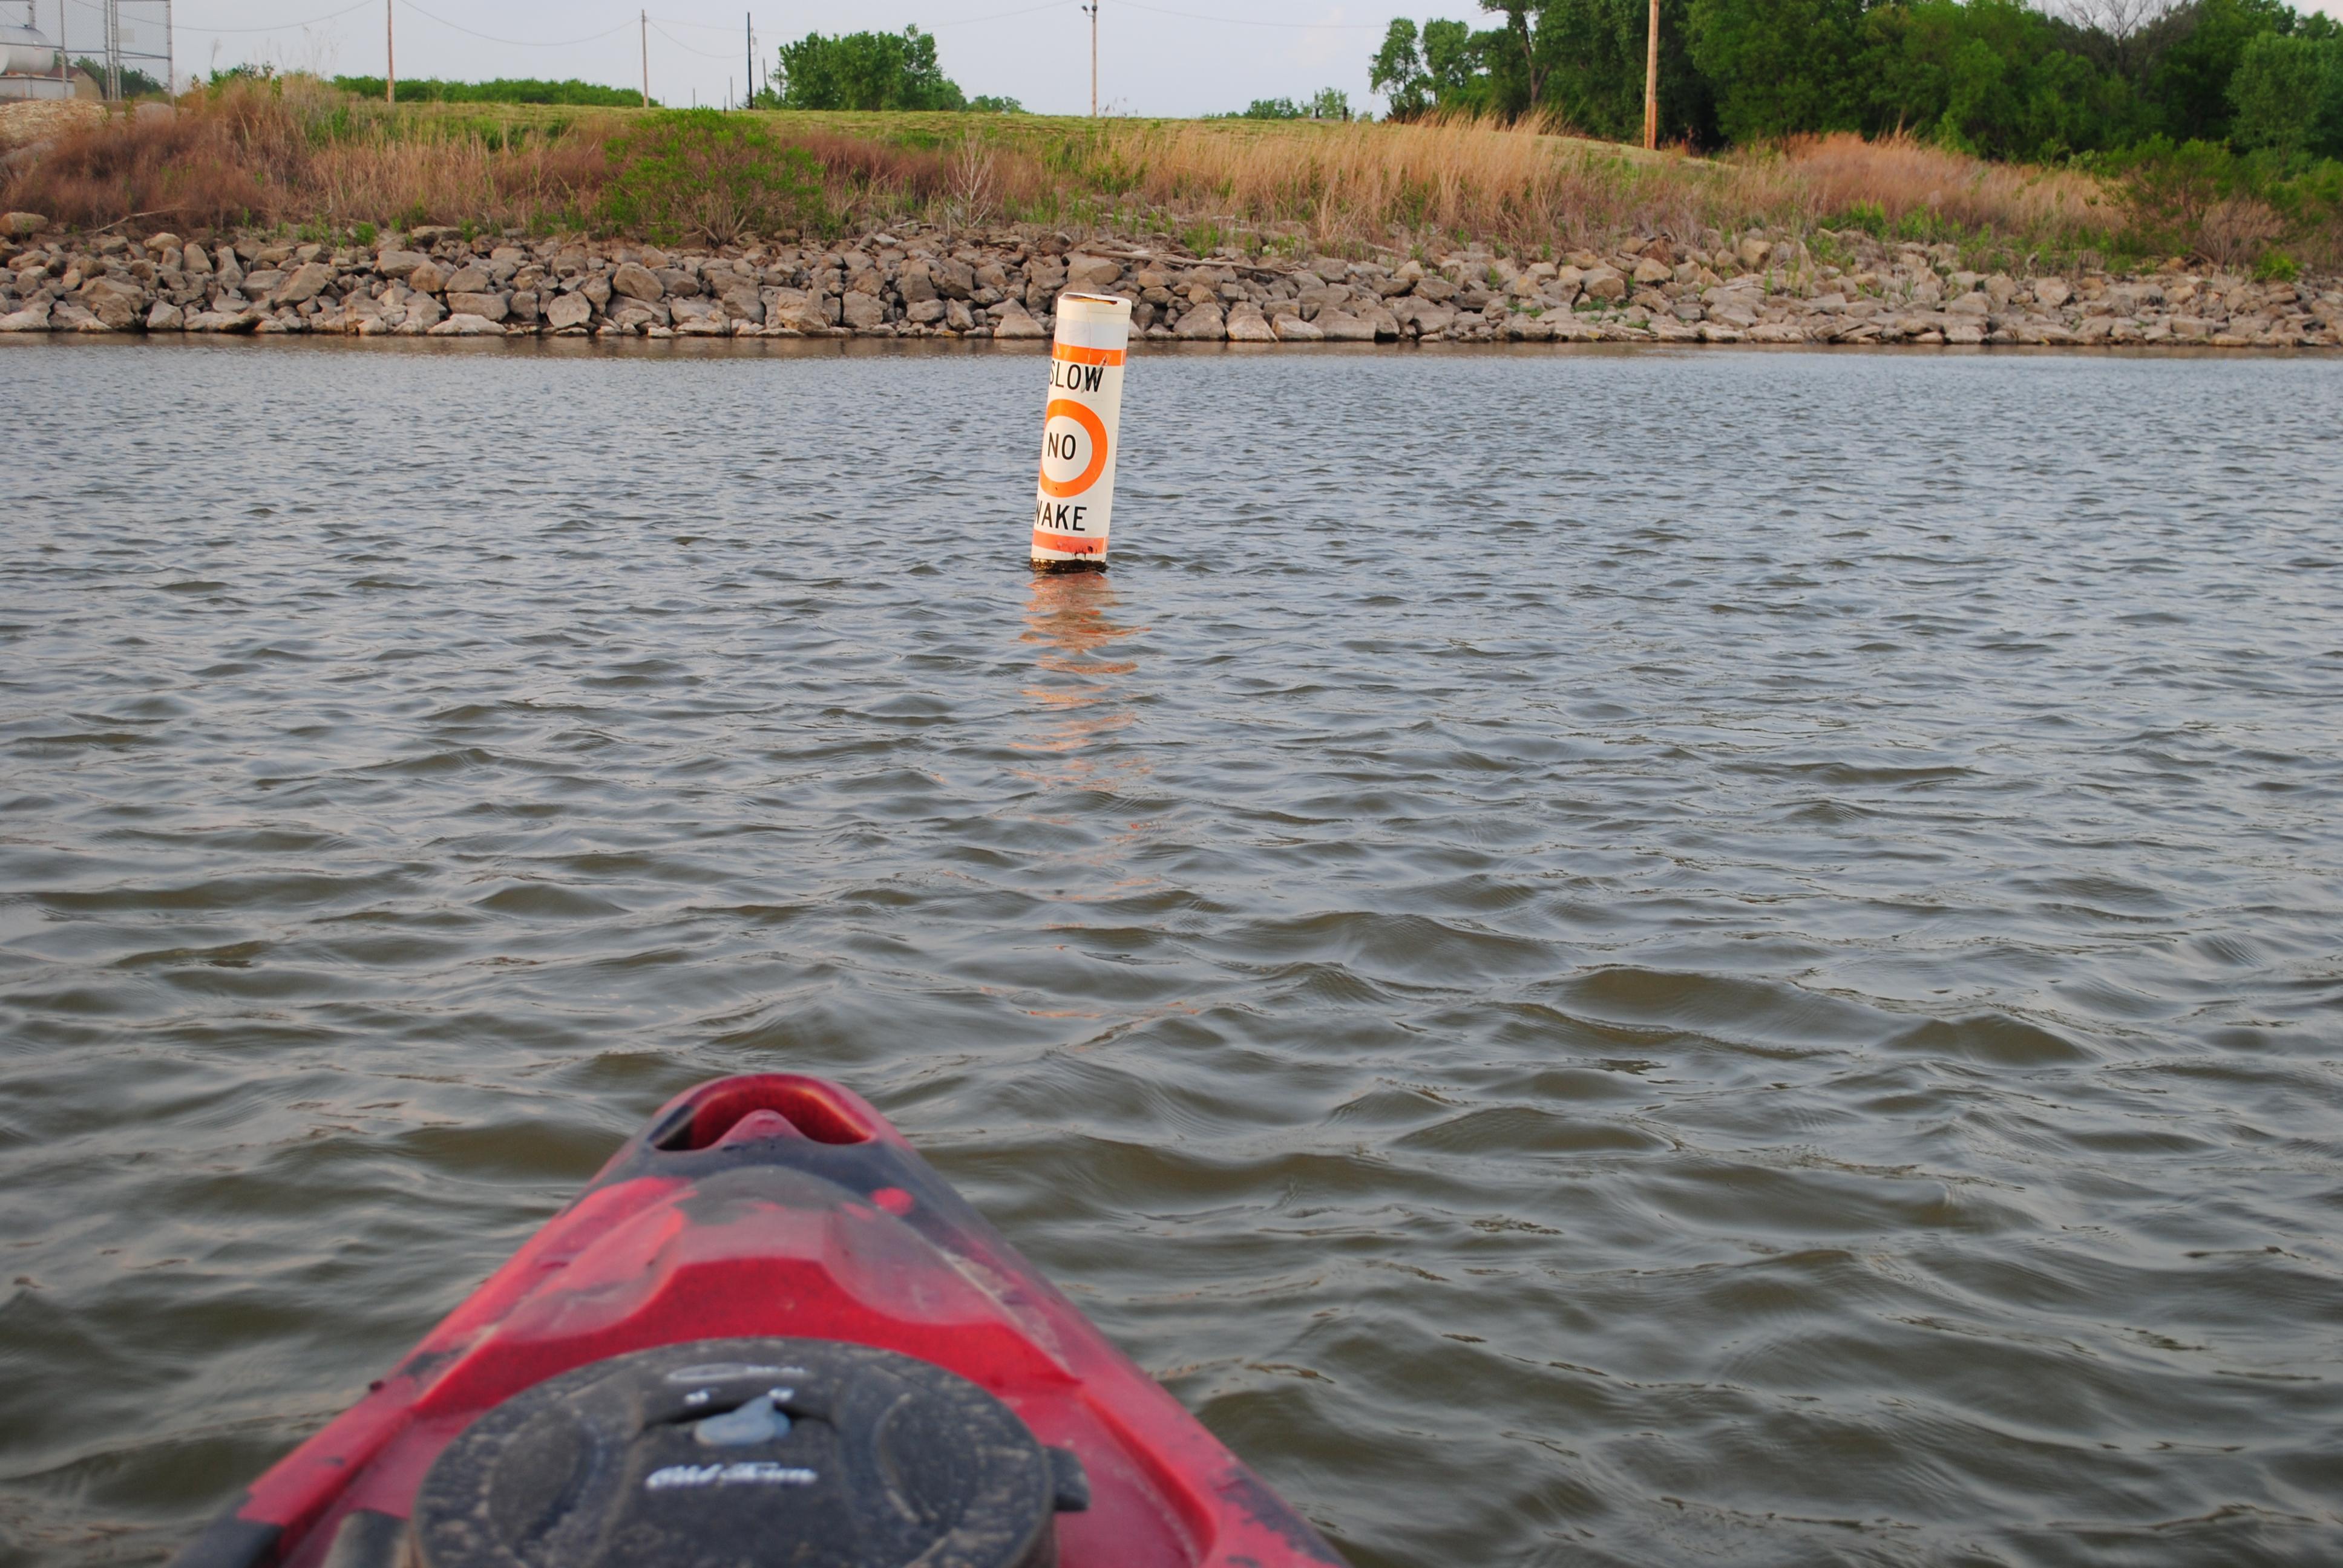 Pedal, Fish, Catch: Old Town Predator PDL Kayak Review